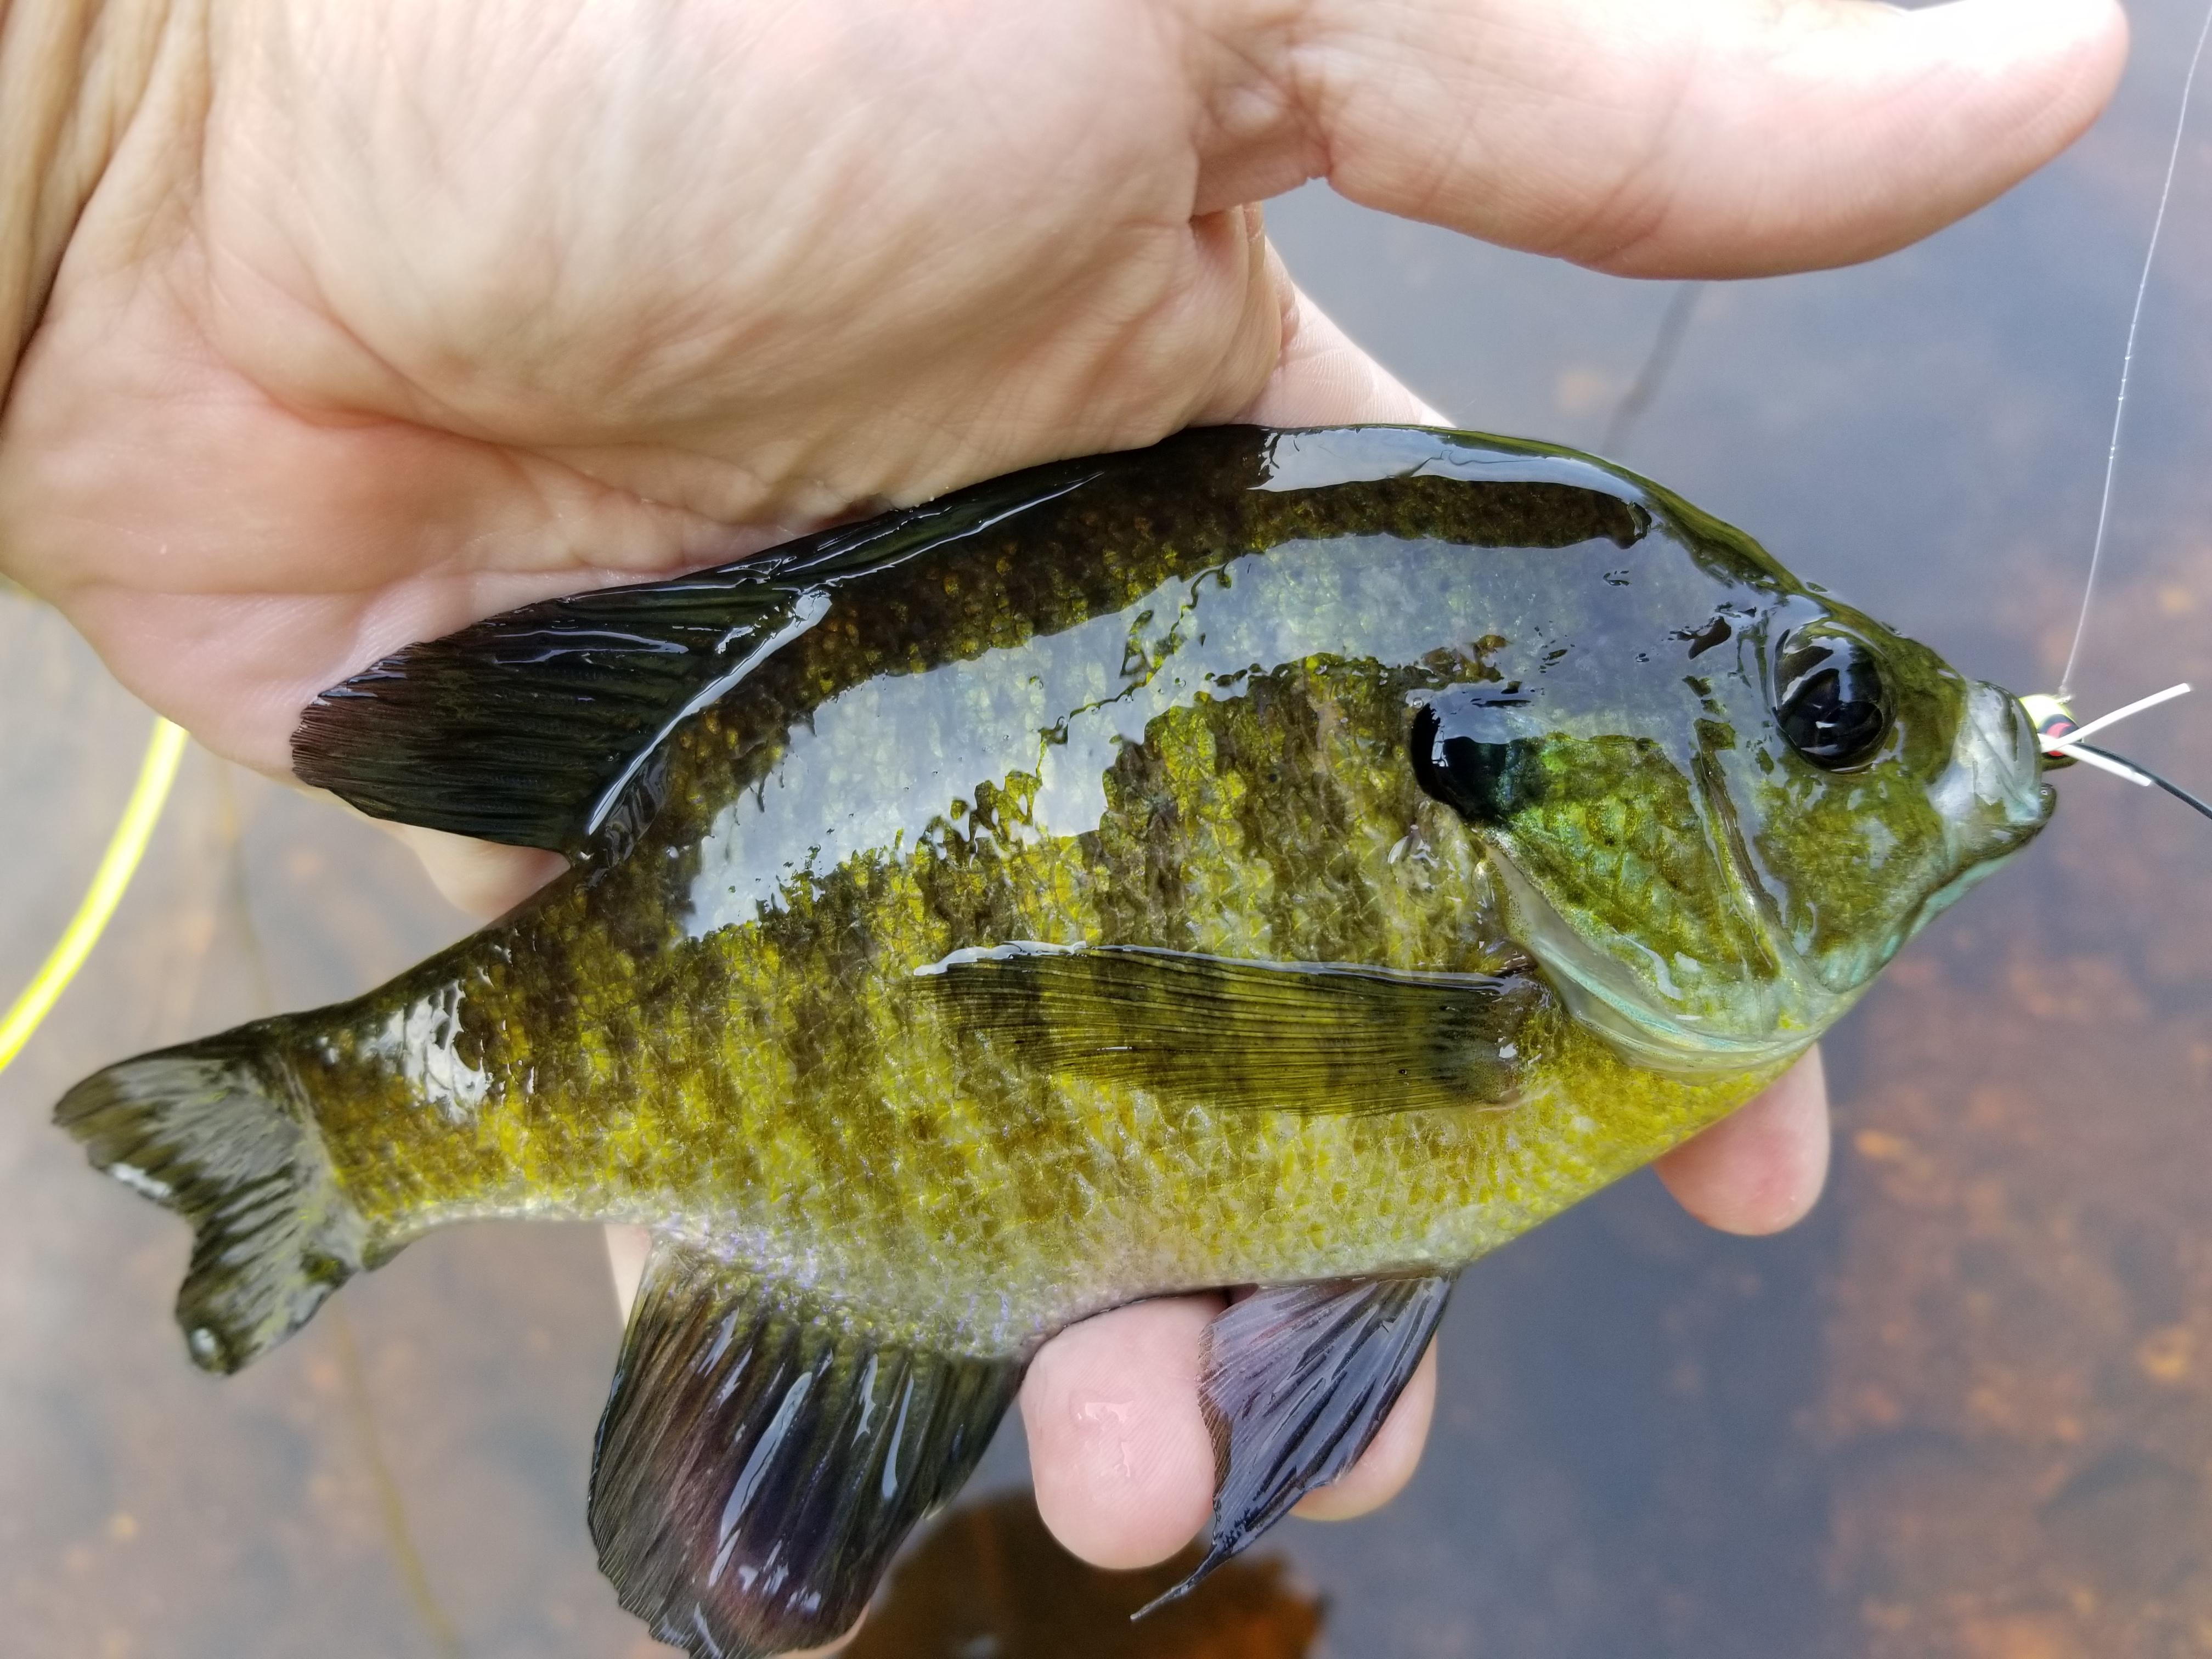 6 Black fly fishing hard body ants Ice Fishing # 14 hooks panfish bluegill trout